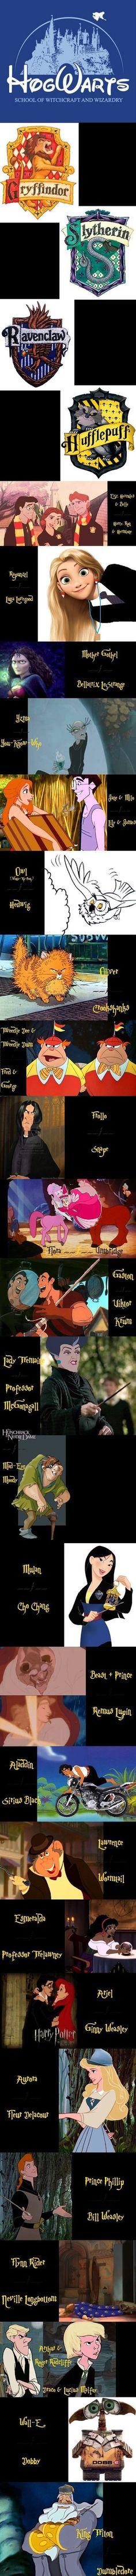 Disney's Harry Potter…